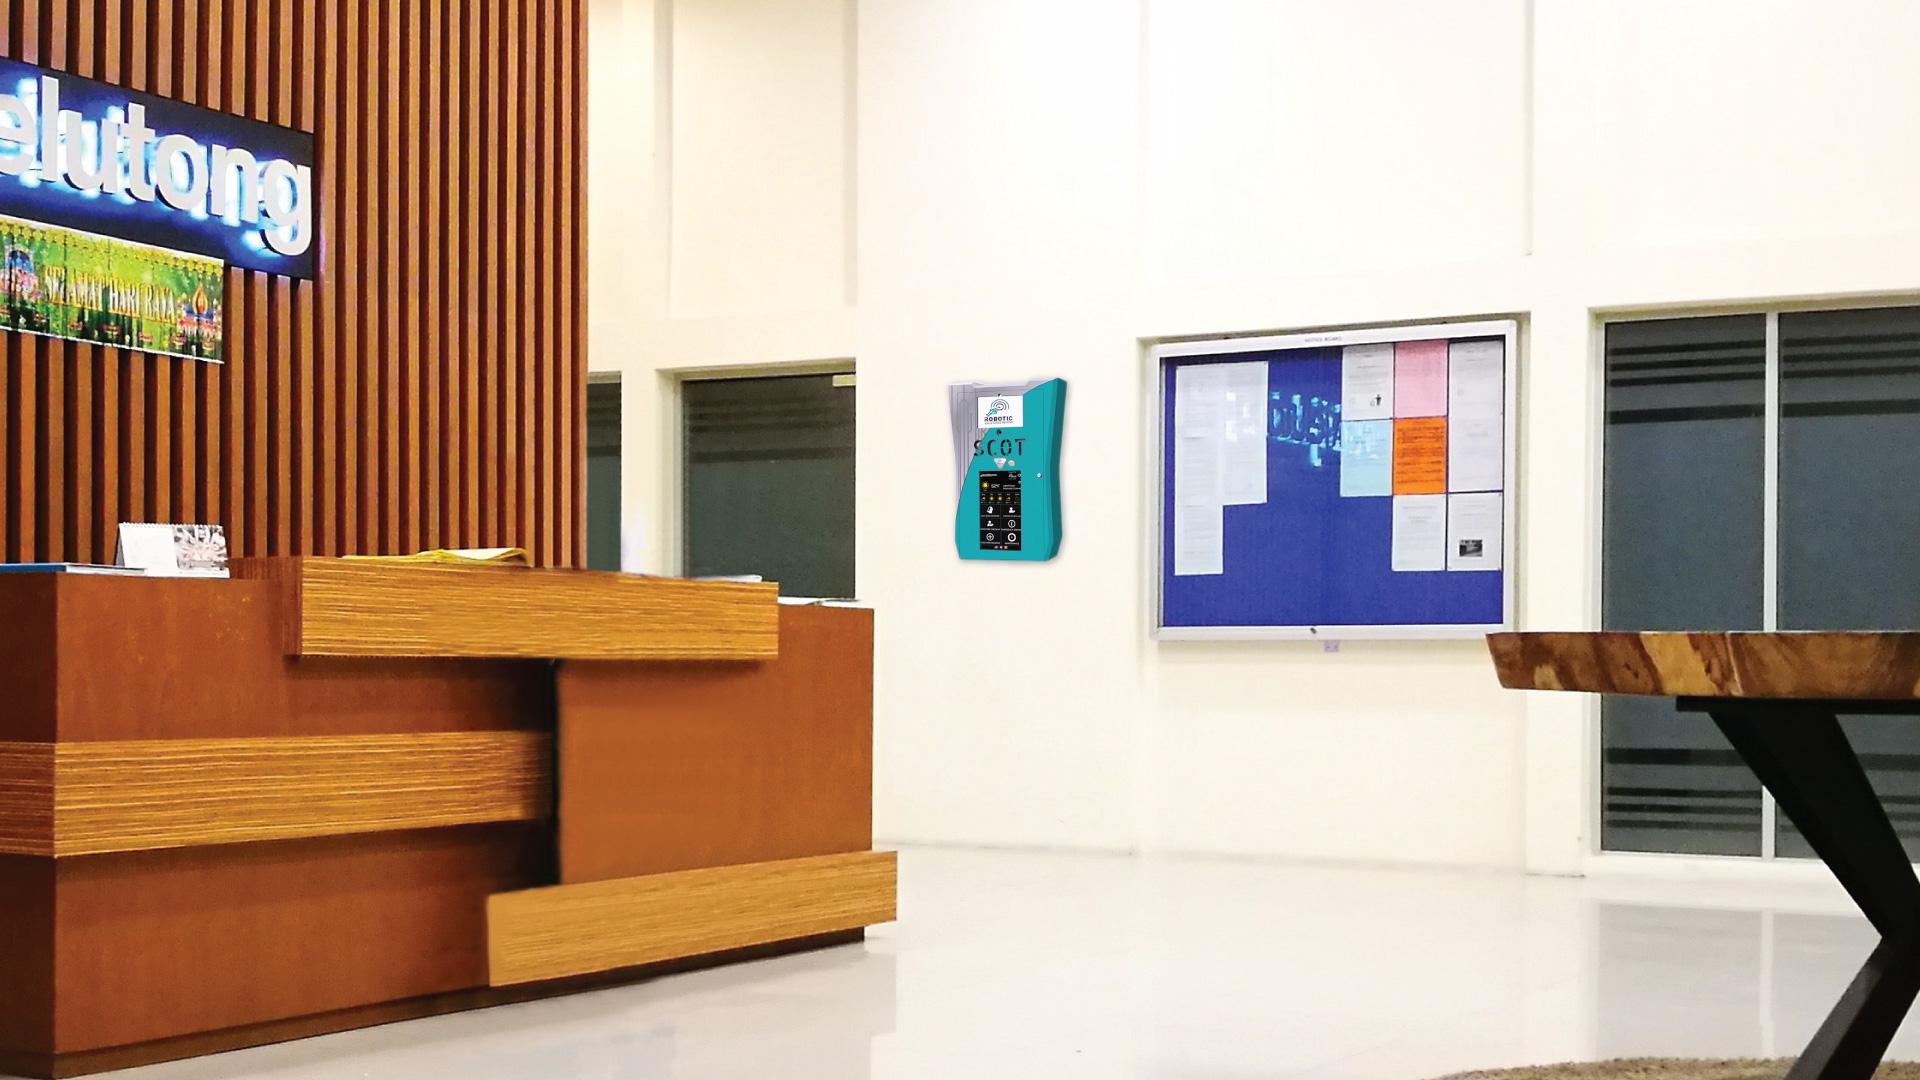 ars vs man guarding indoors reception desk 2 1920x1080 1